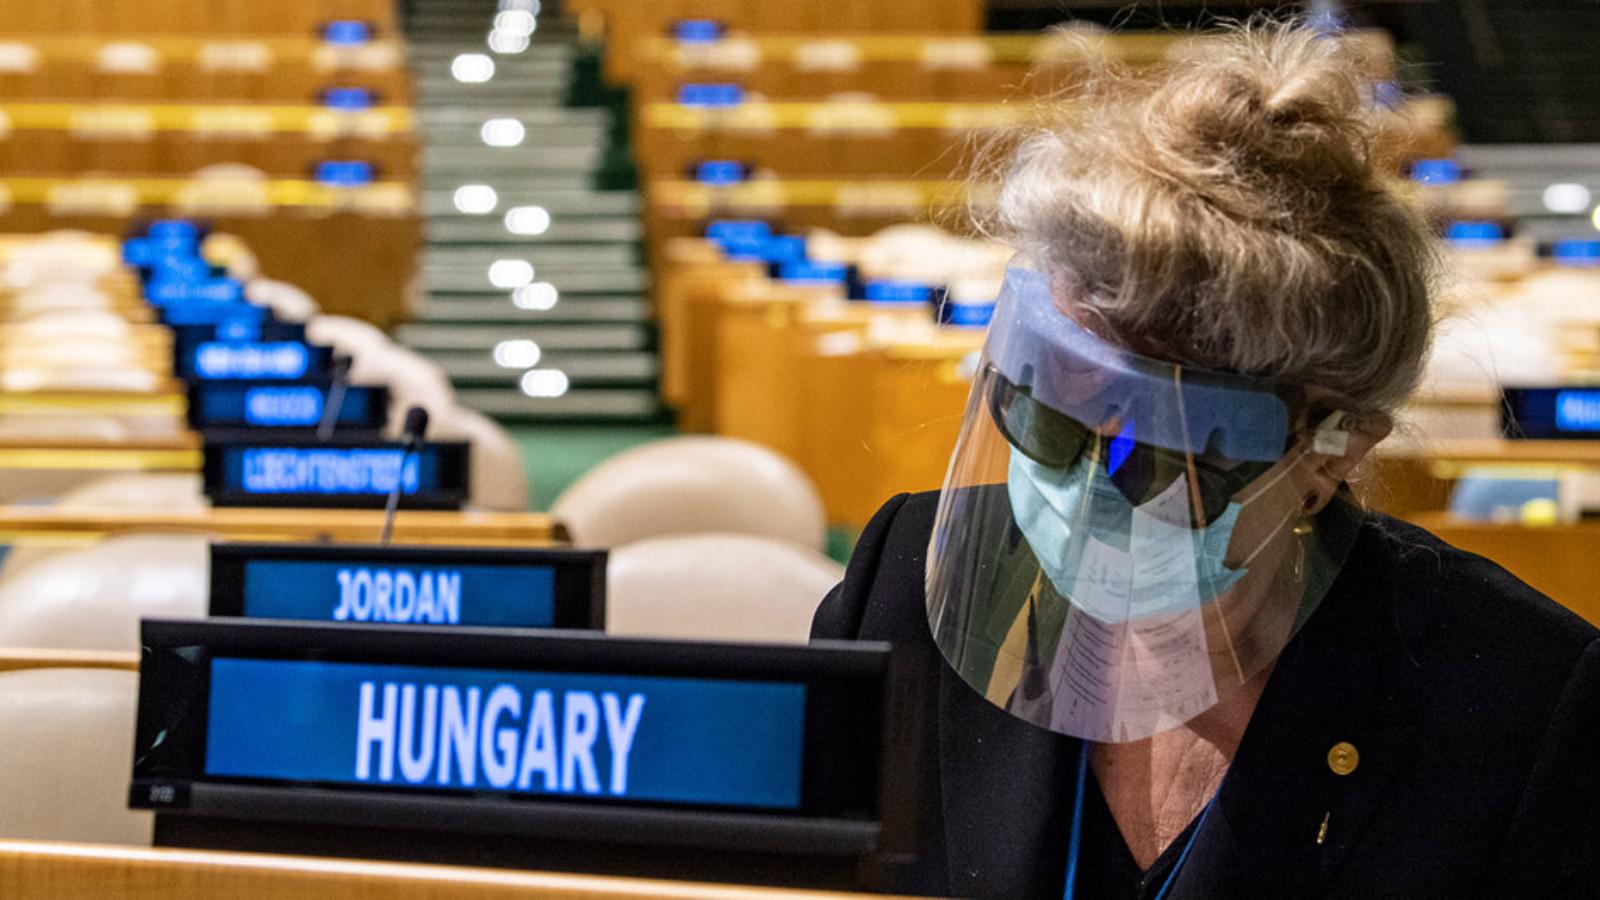 IMAGEM: De Bolsonaro a Macron: a lista completa dos oradores desta terça na ONU